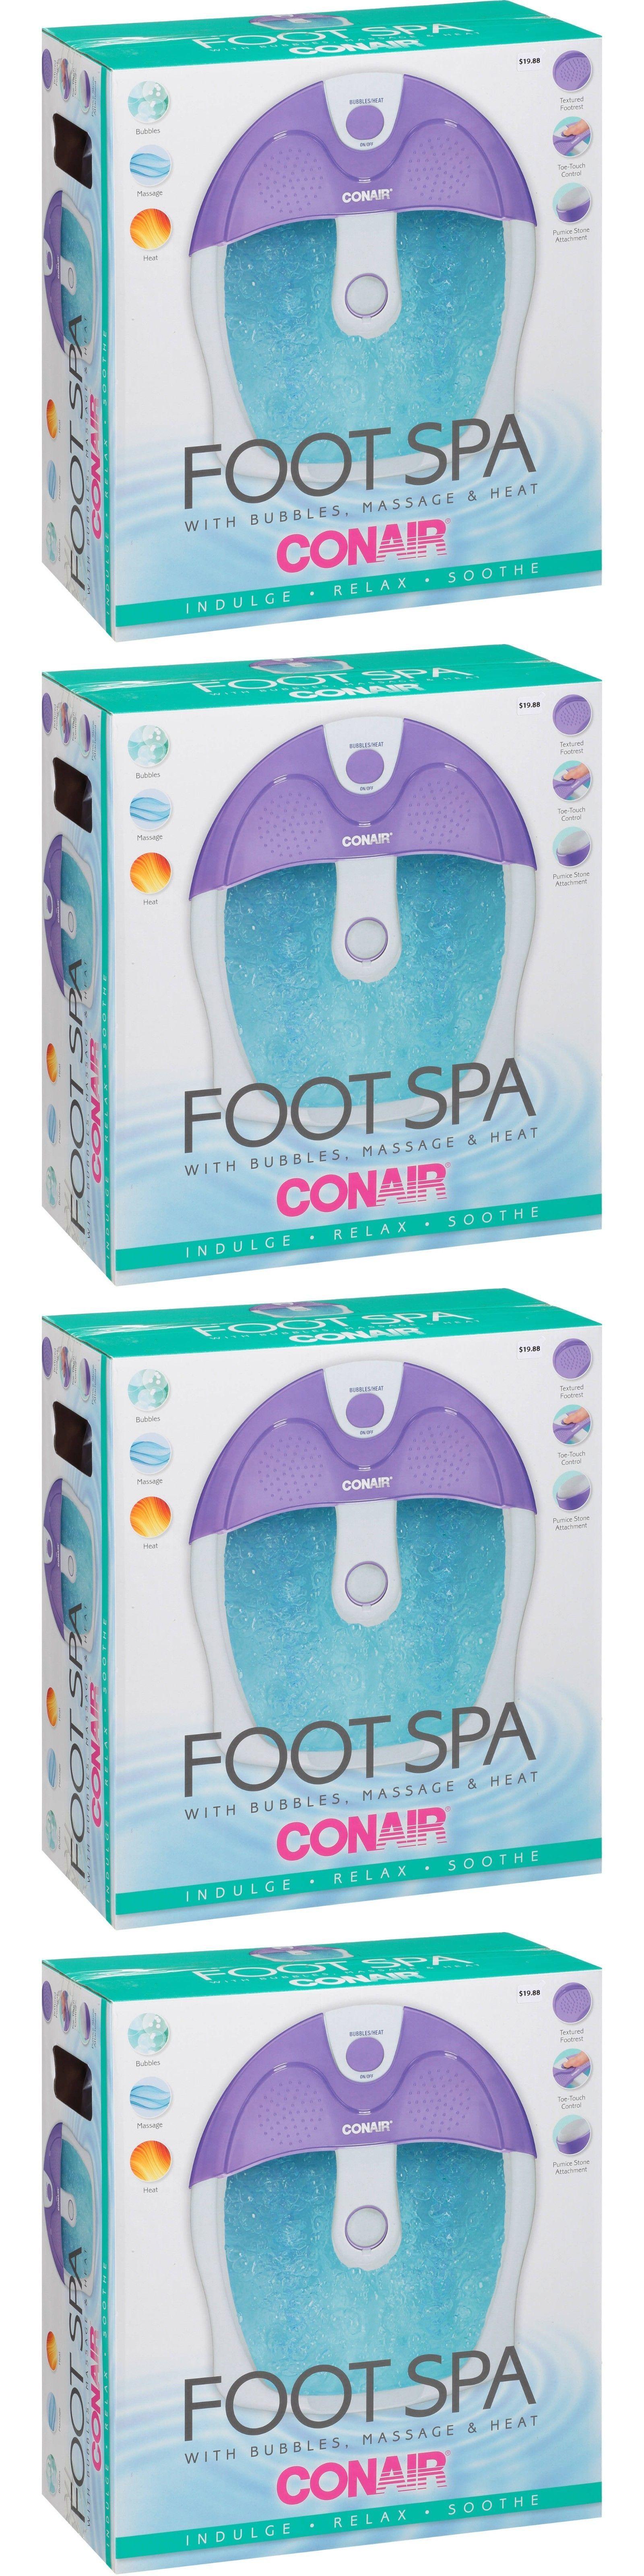 outstanding buy spa bath gift bathtub ideas dilata info